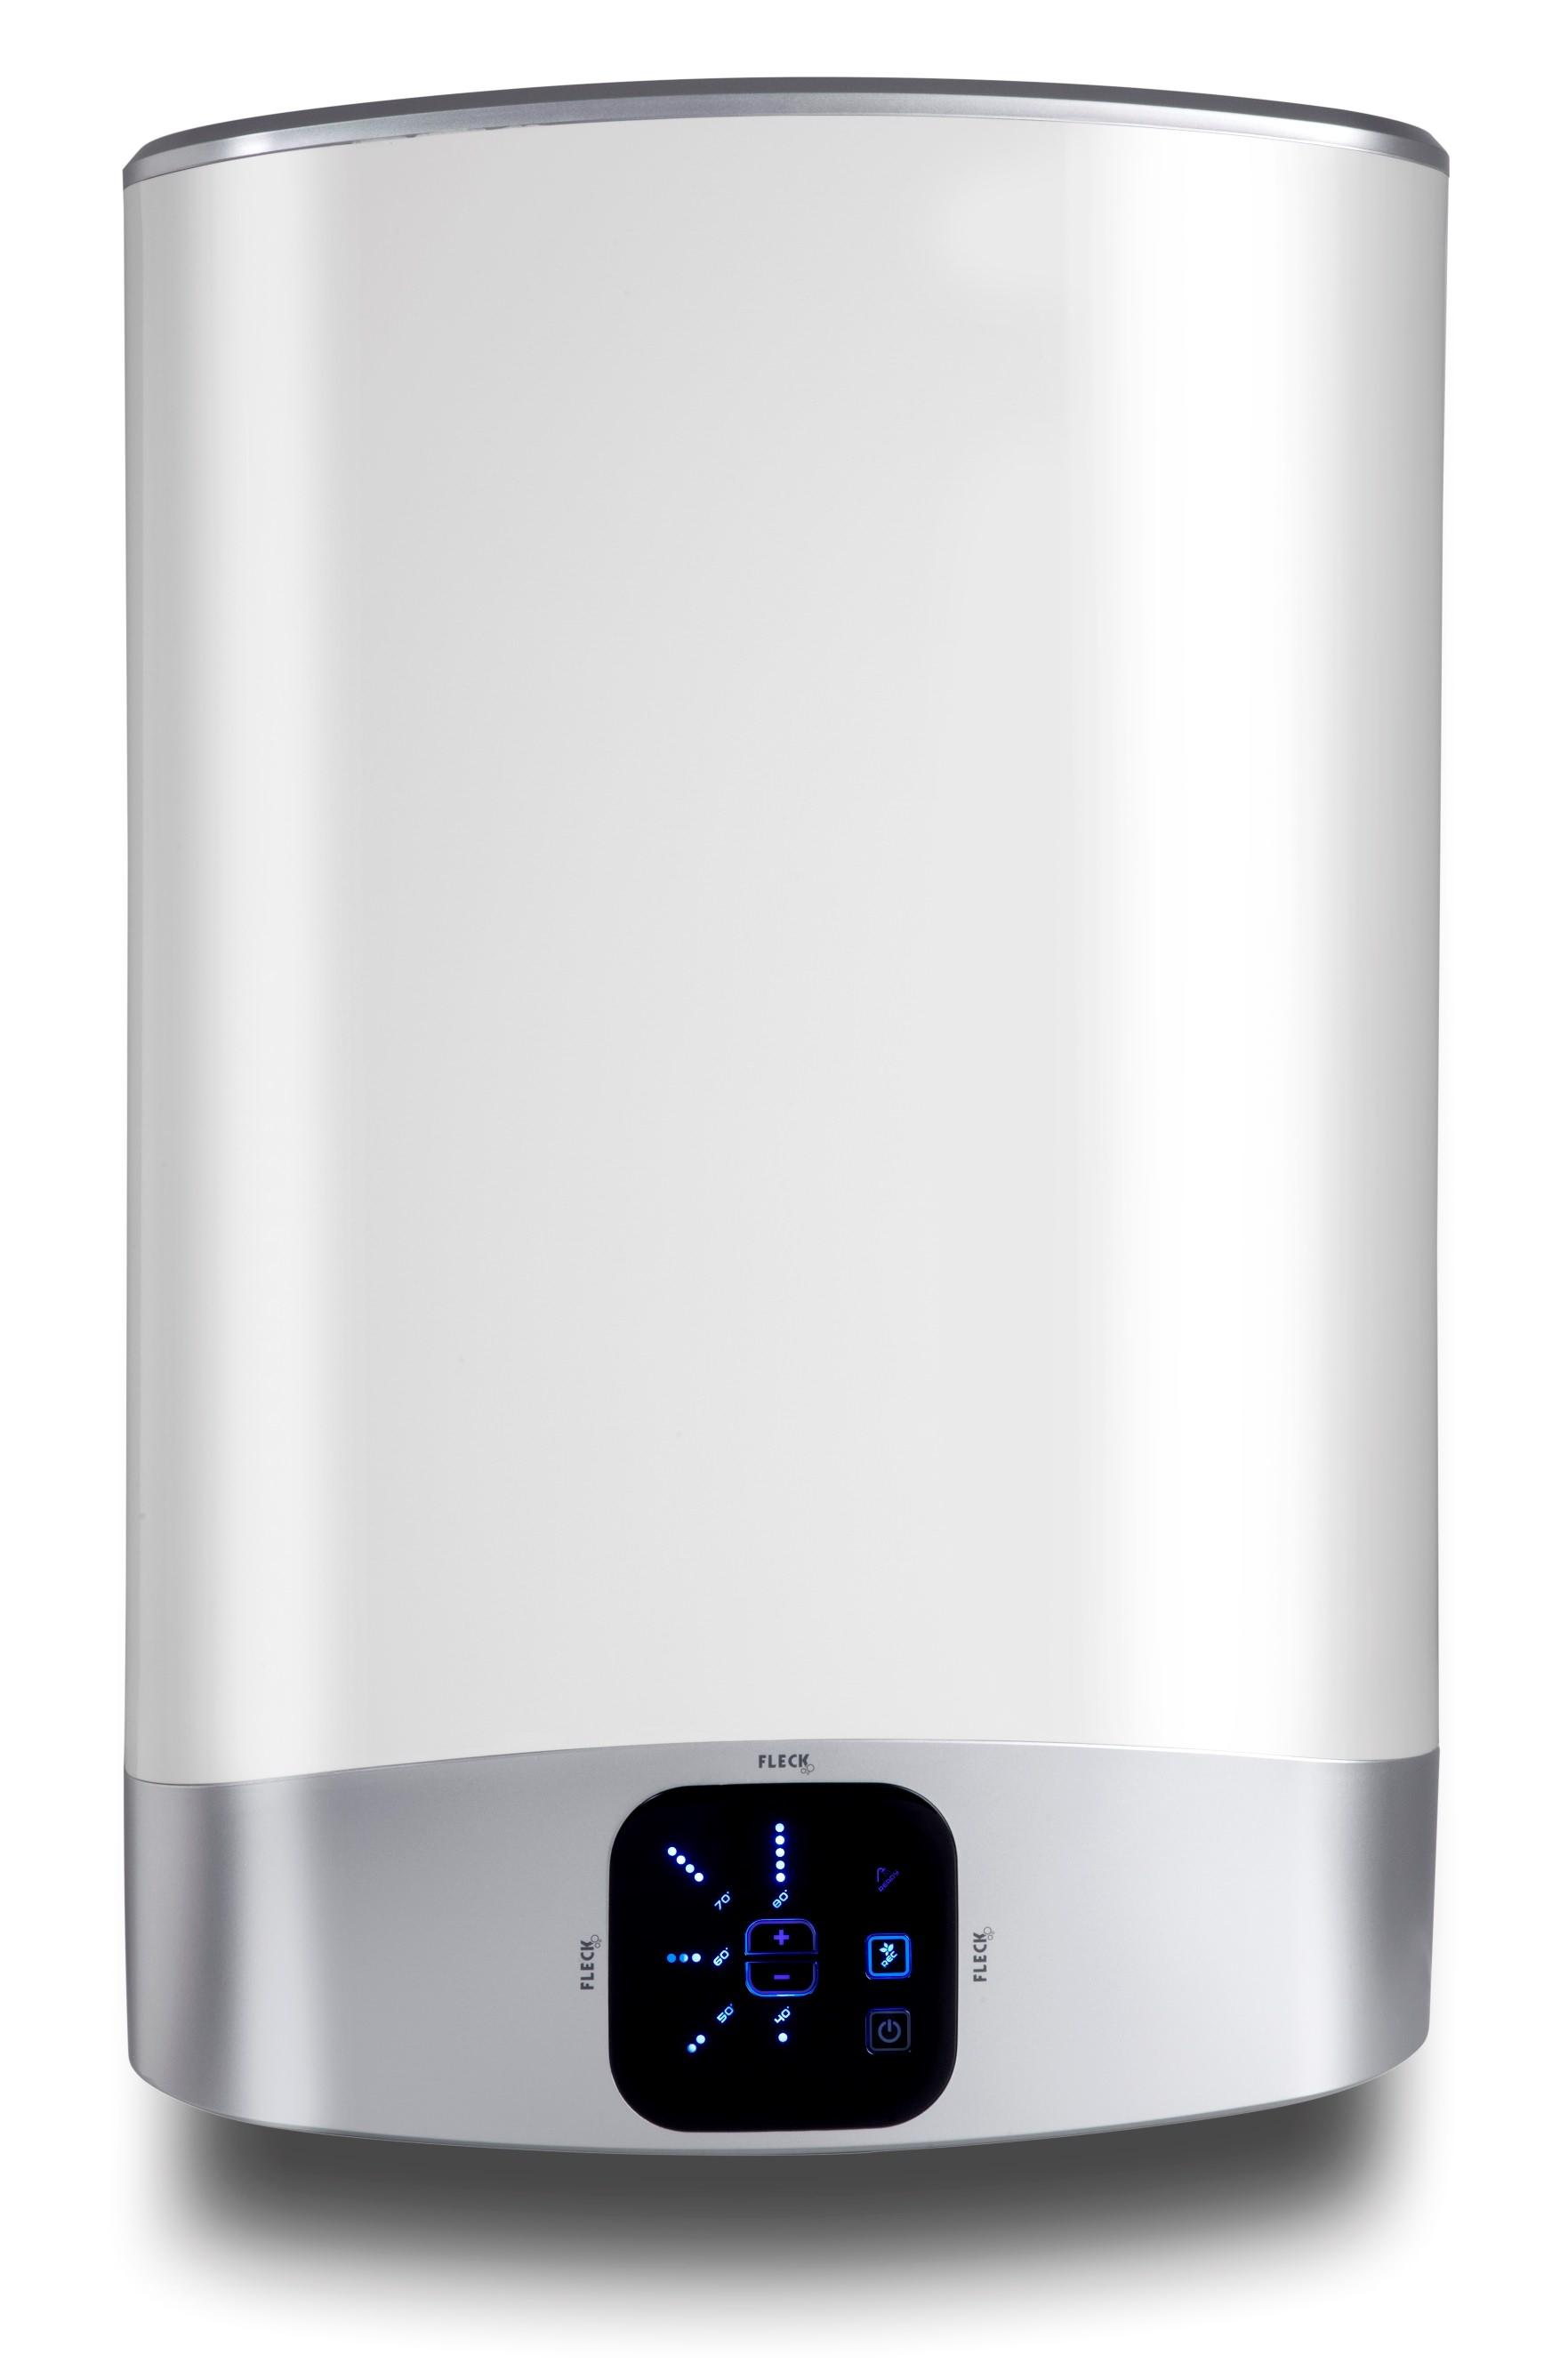 Termo electrico Fleck Duo5 de 30 litros